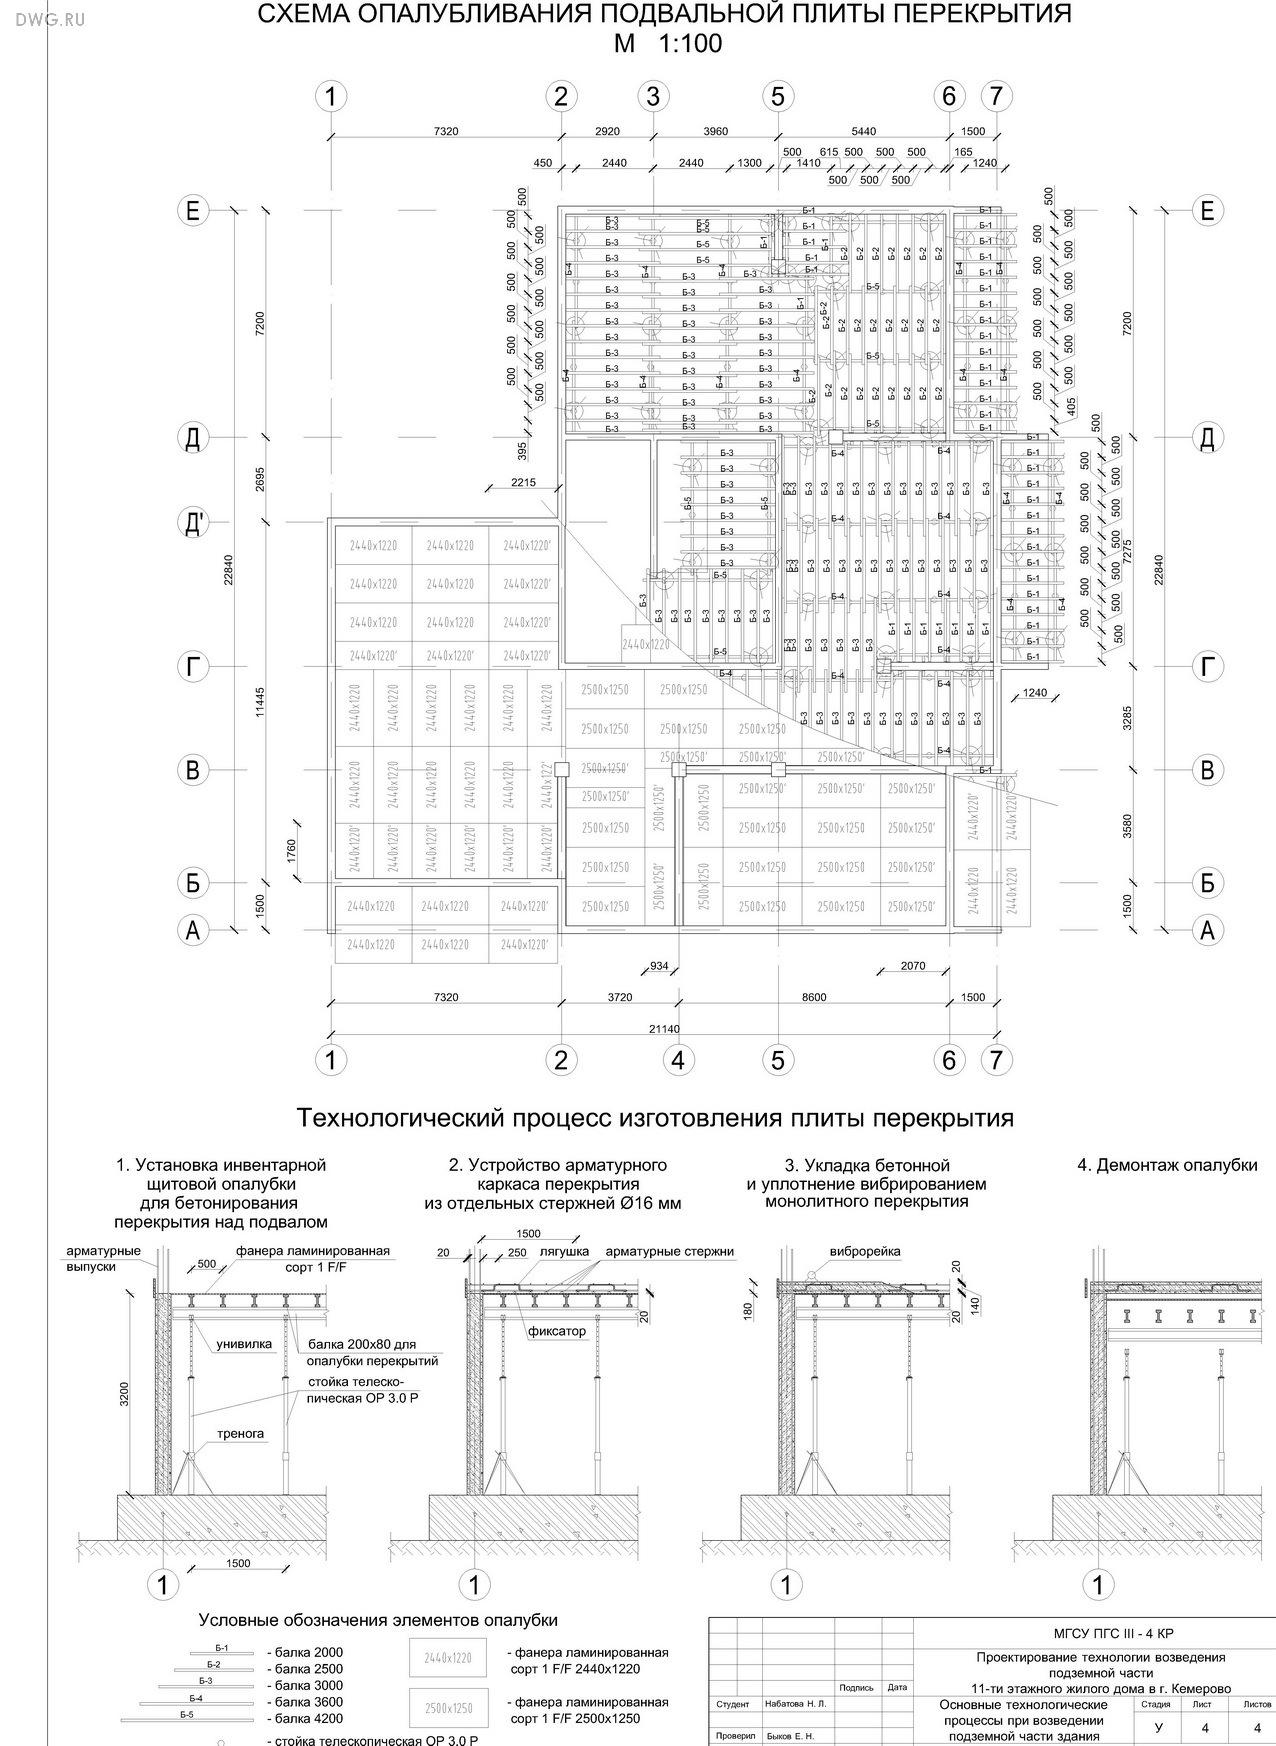 Курсовой проект по ТСП №